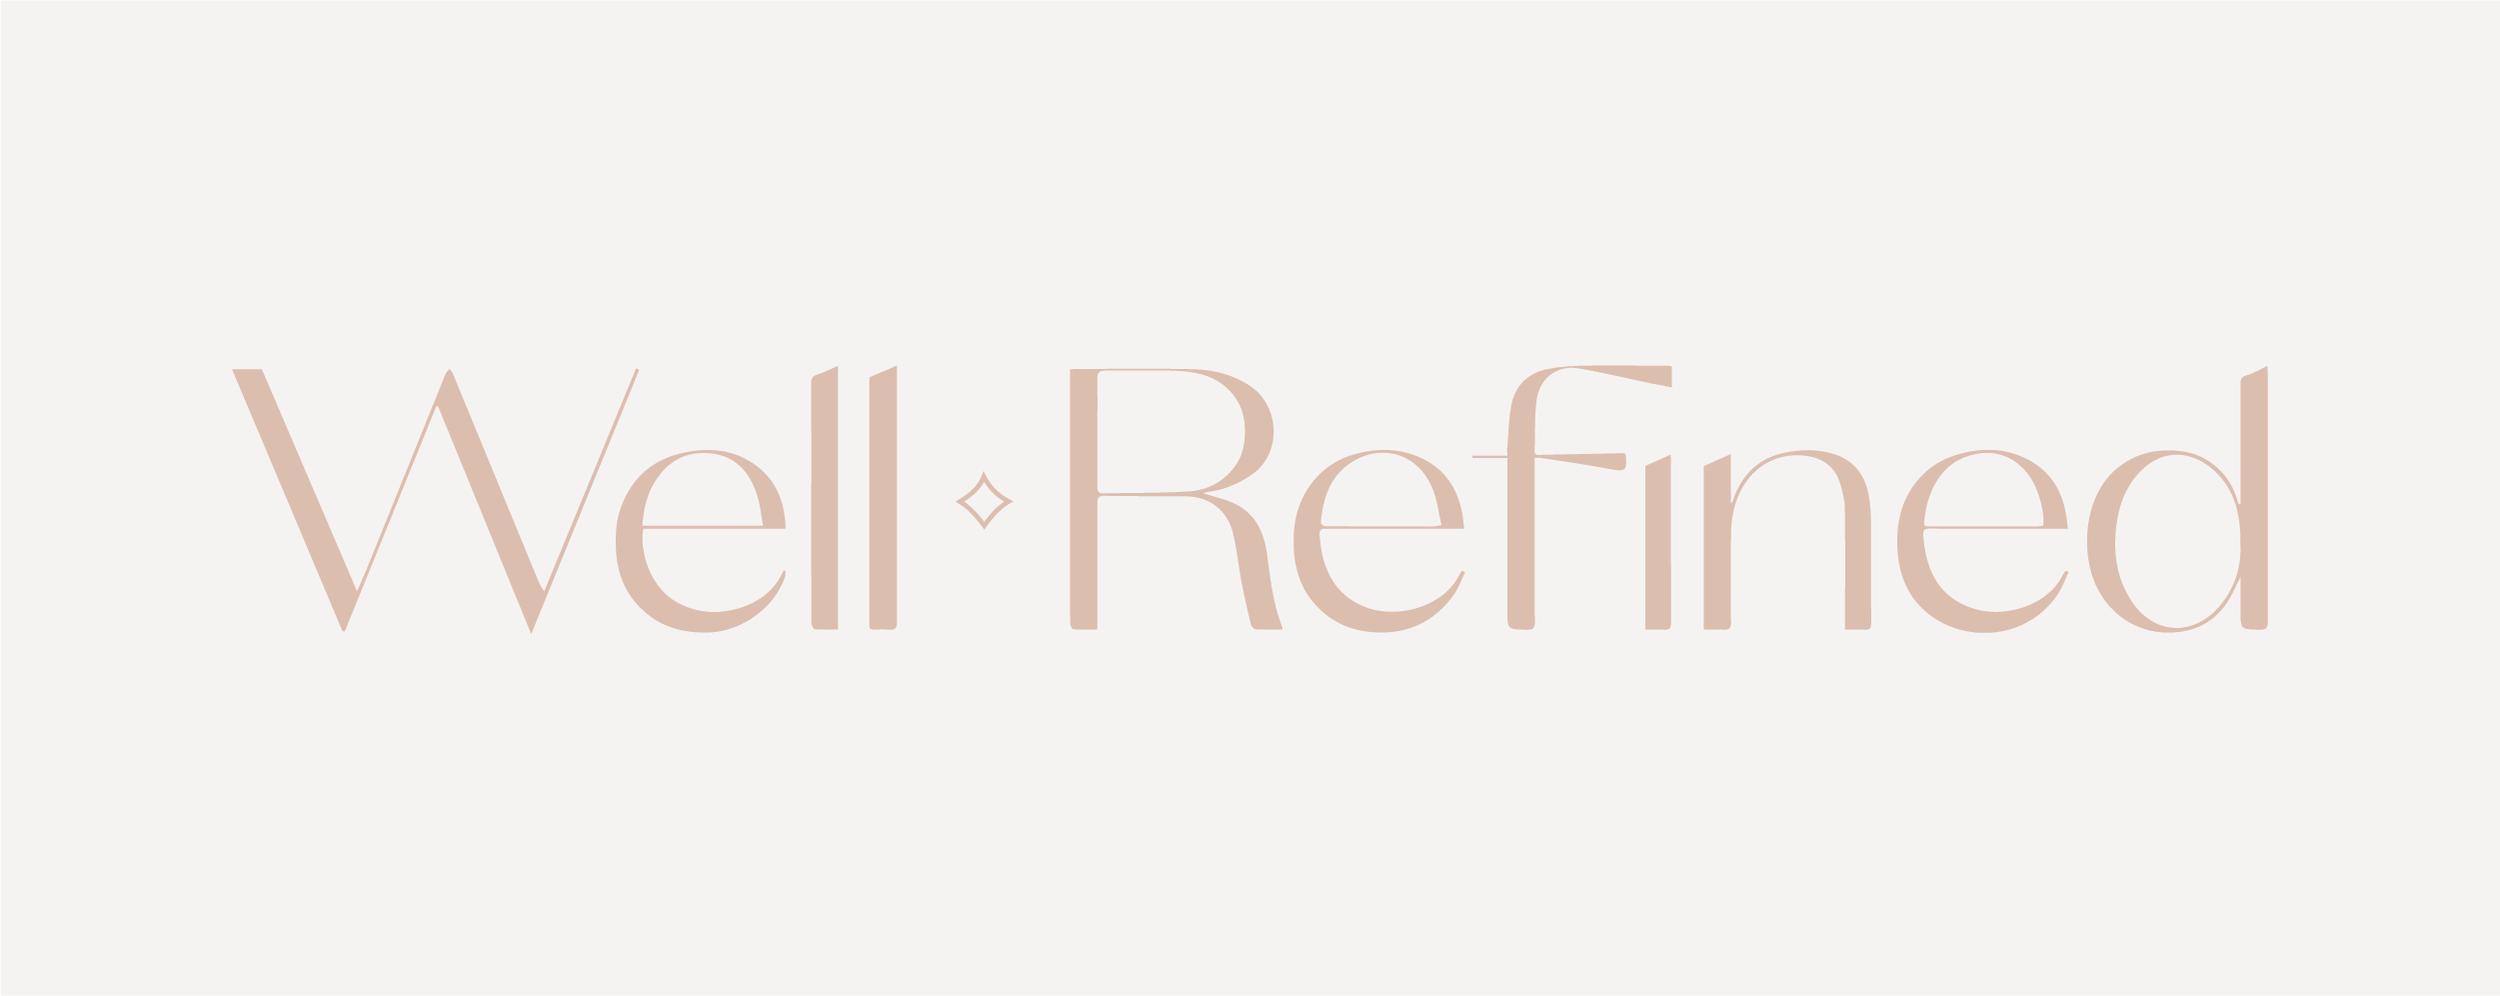 Well Refined Holistic Wellness Branding And Web Design June Mango Design